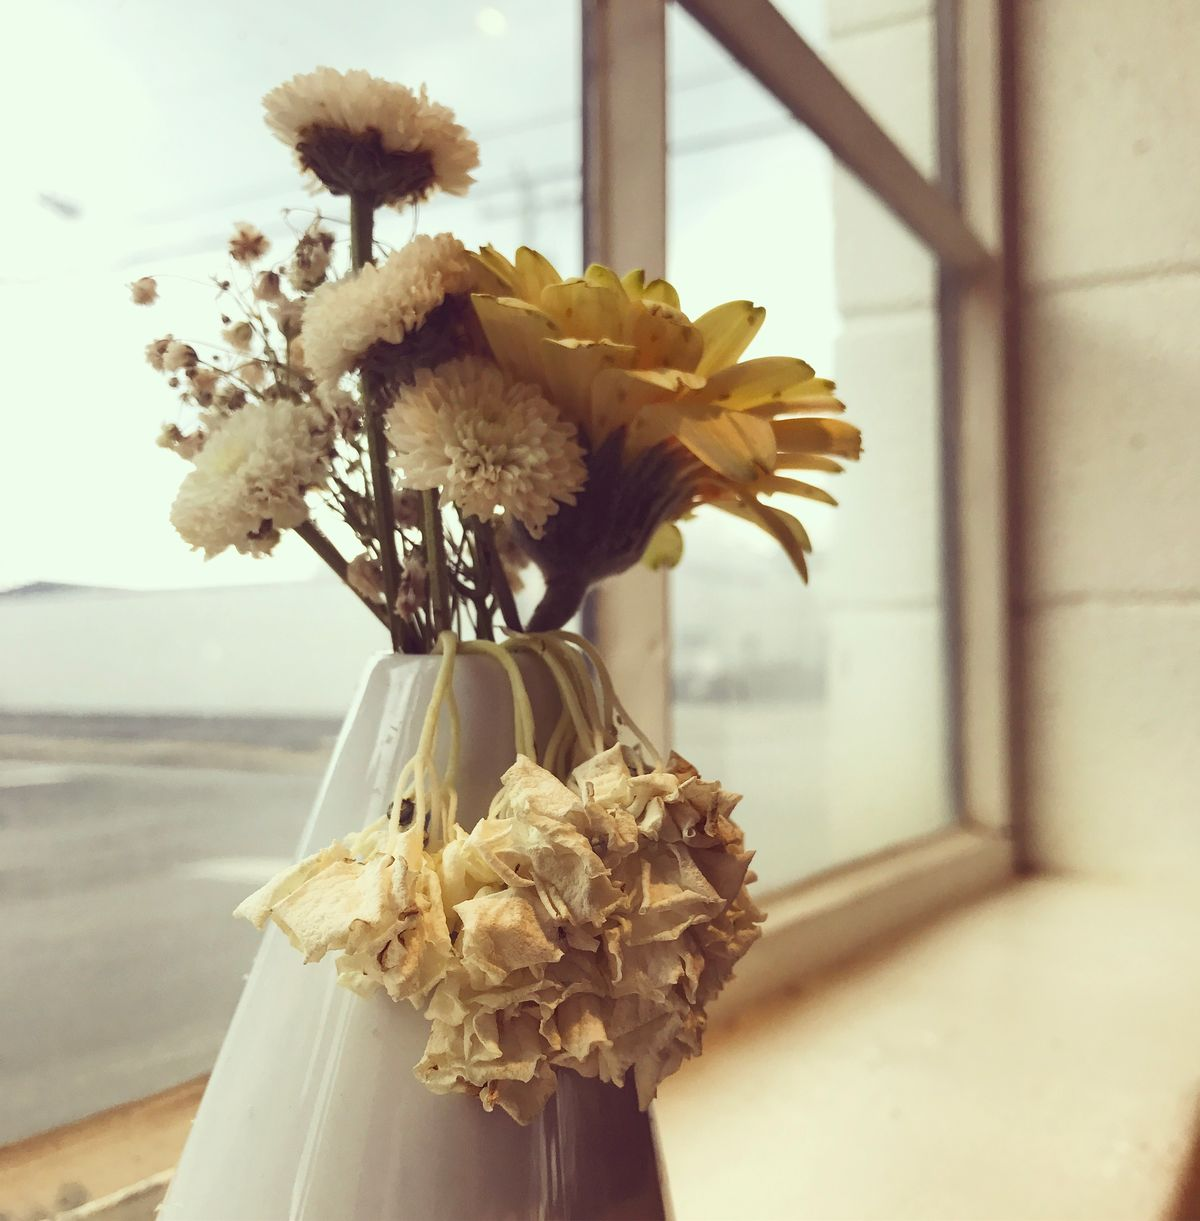 To Bloom Despite Adversity